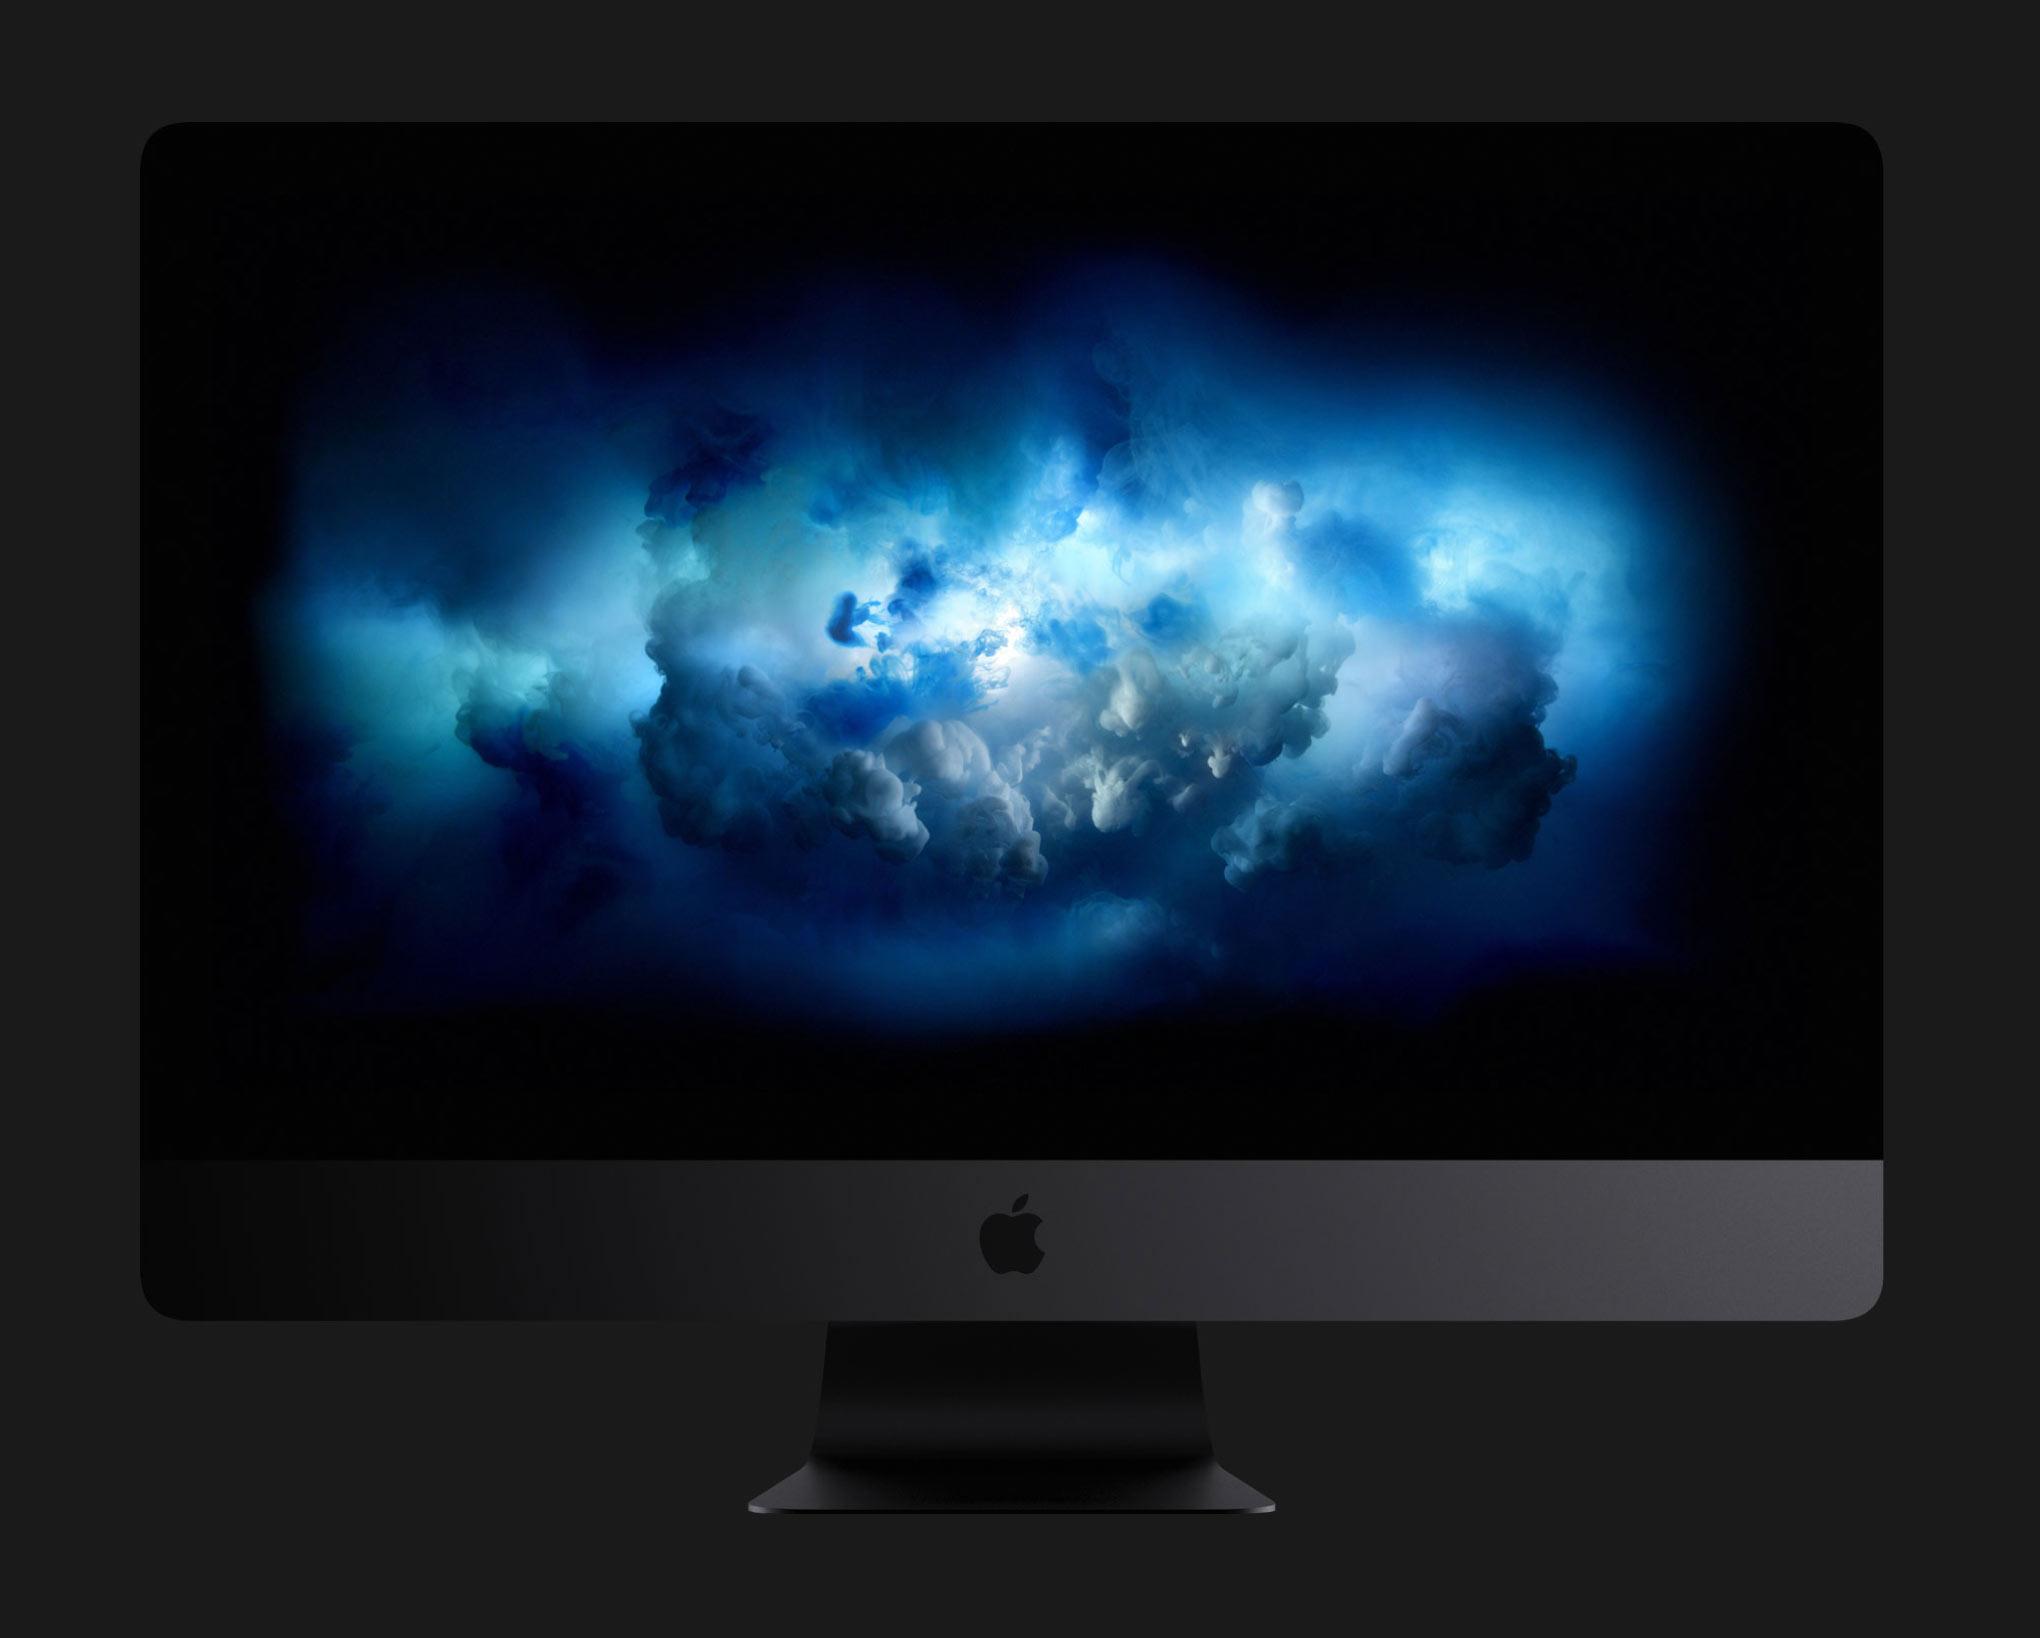 iMac Proの写真